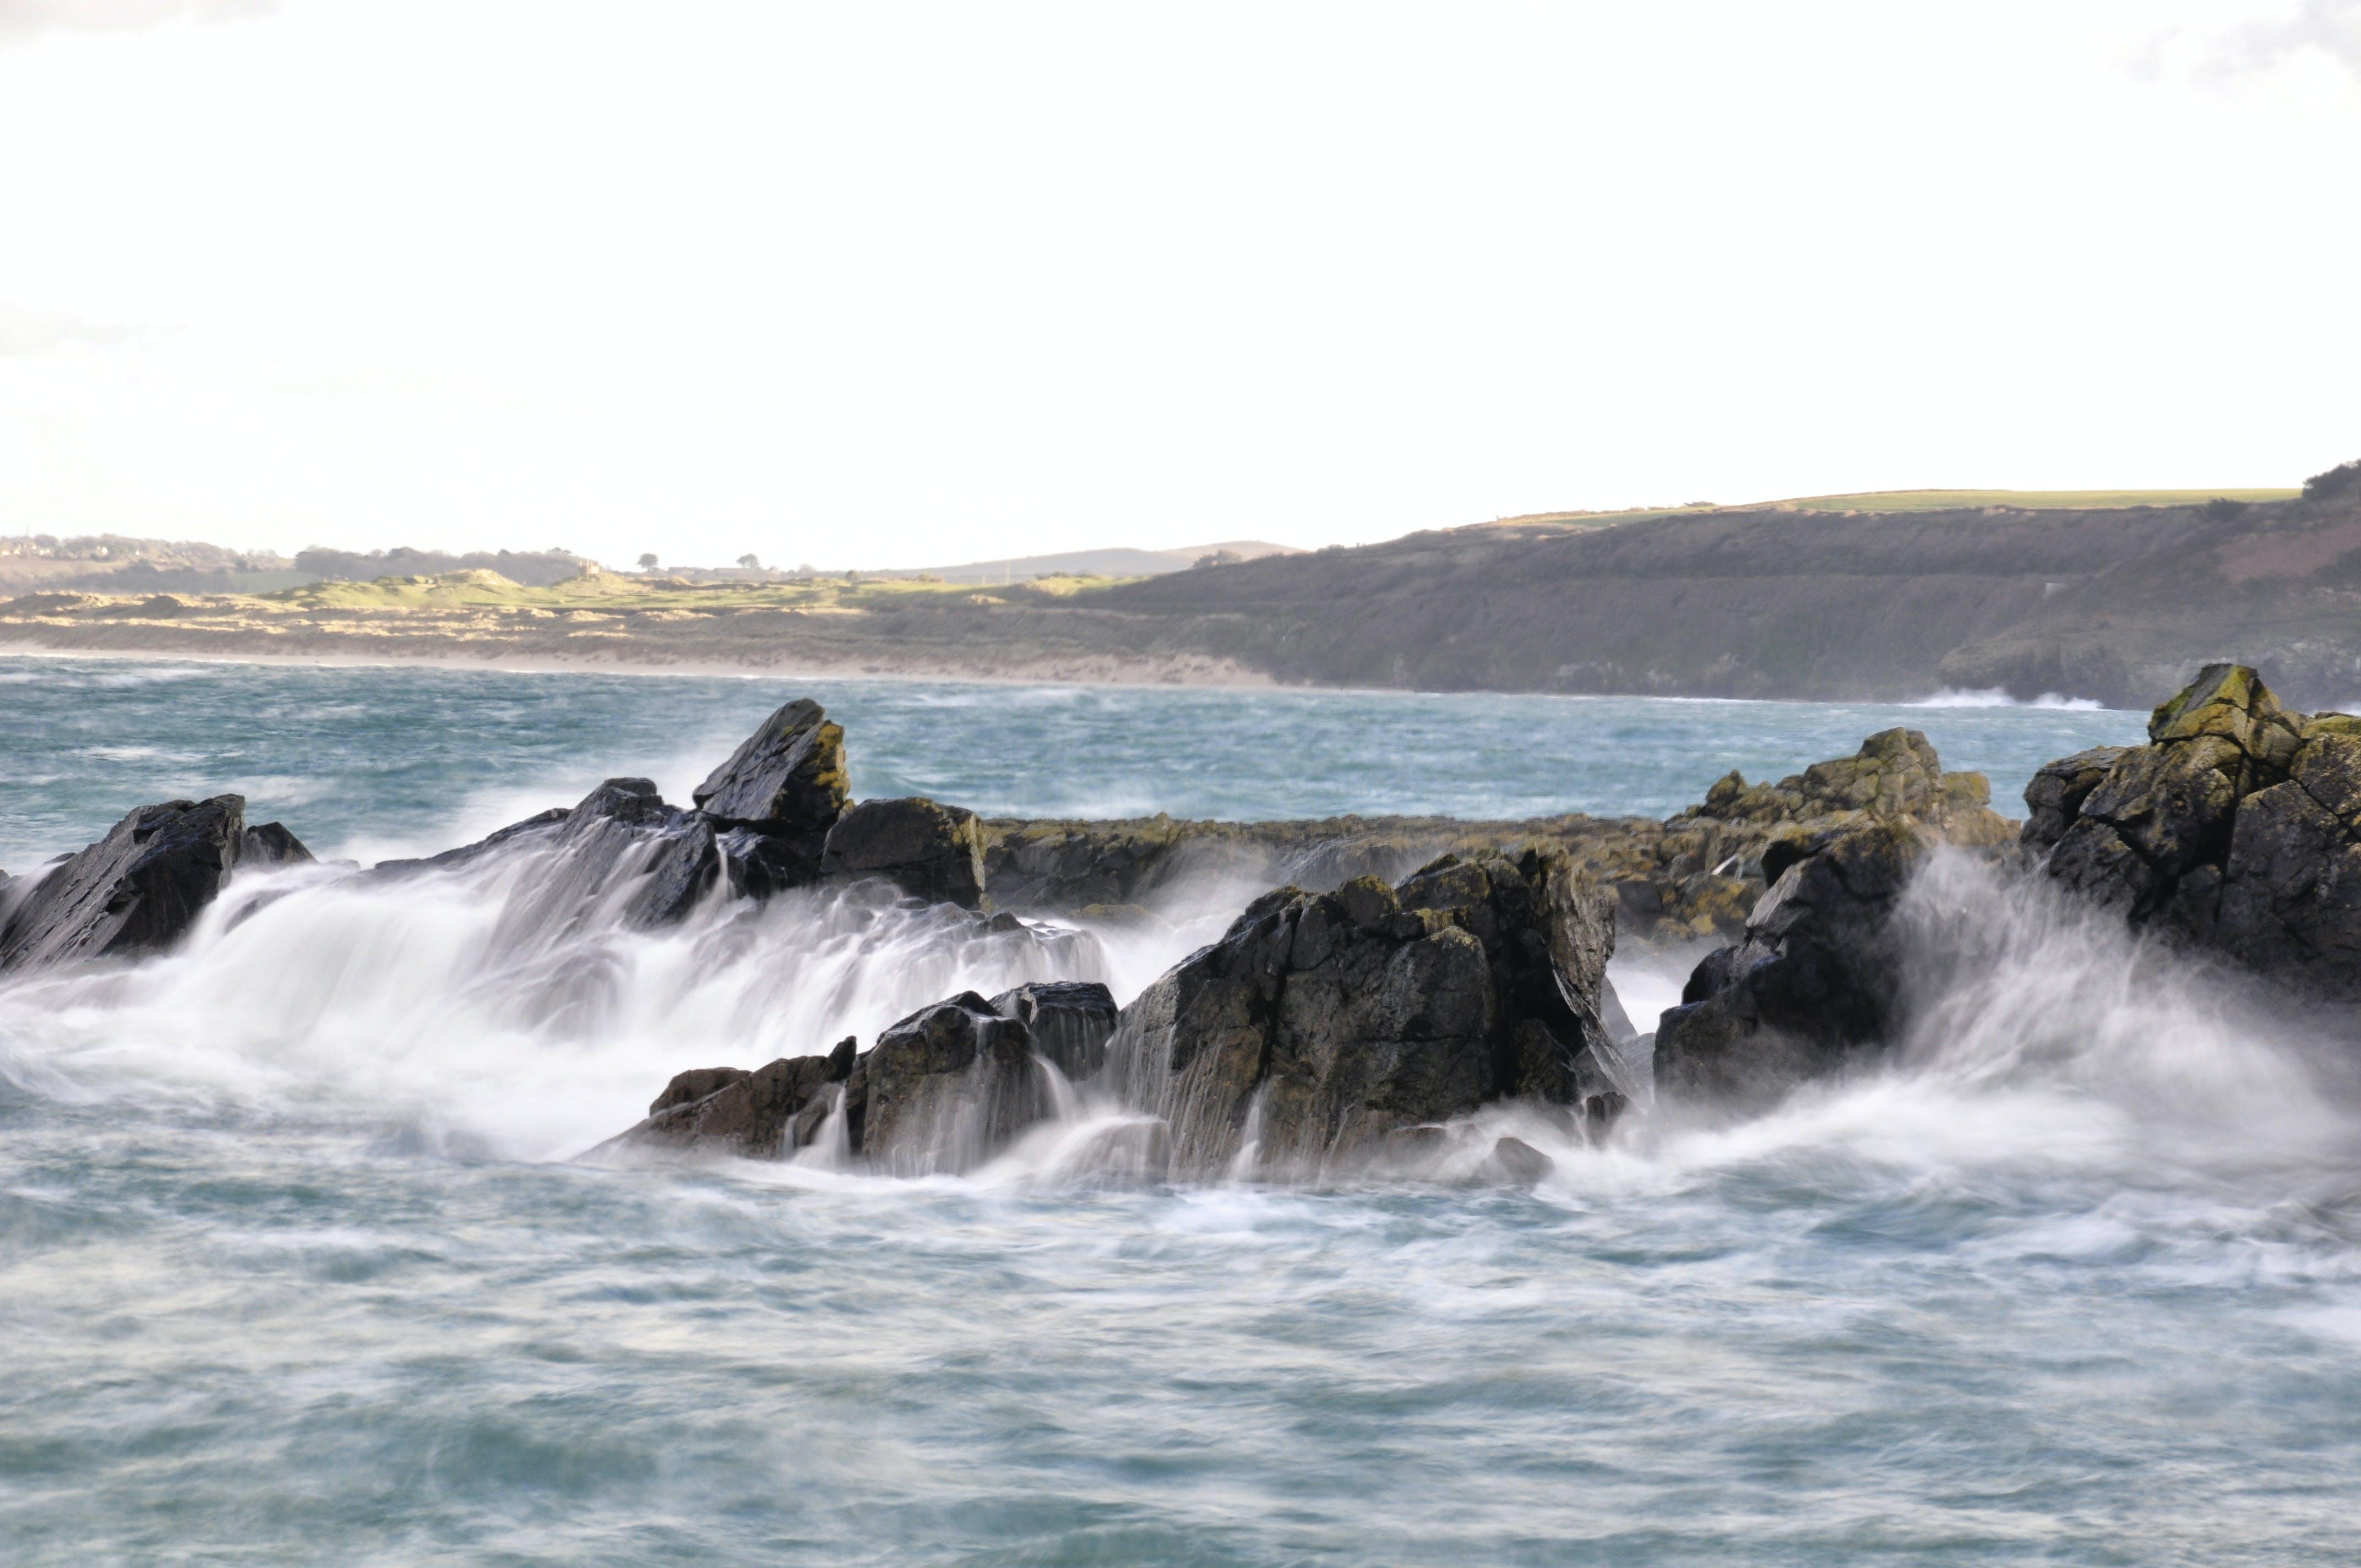 Free stock photo of coast line, rocks, waves breaking